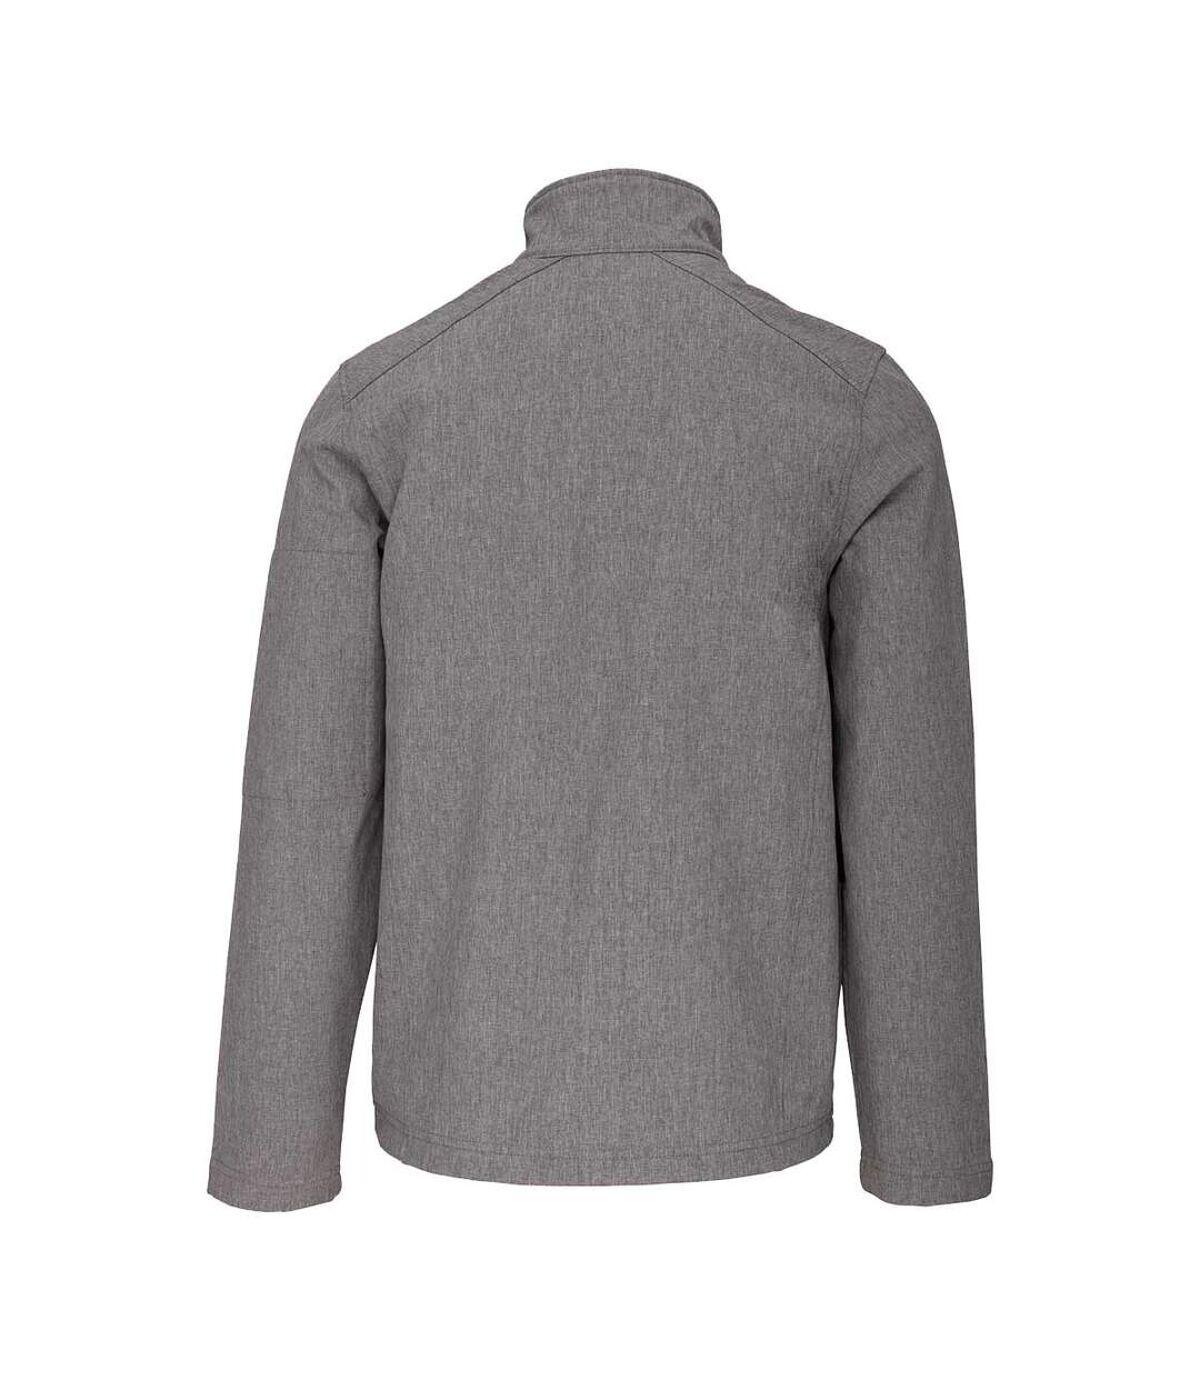 Kariban Mens Soft Shell Jacket (Aqua) - UTPC3824